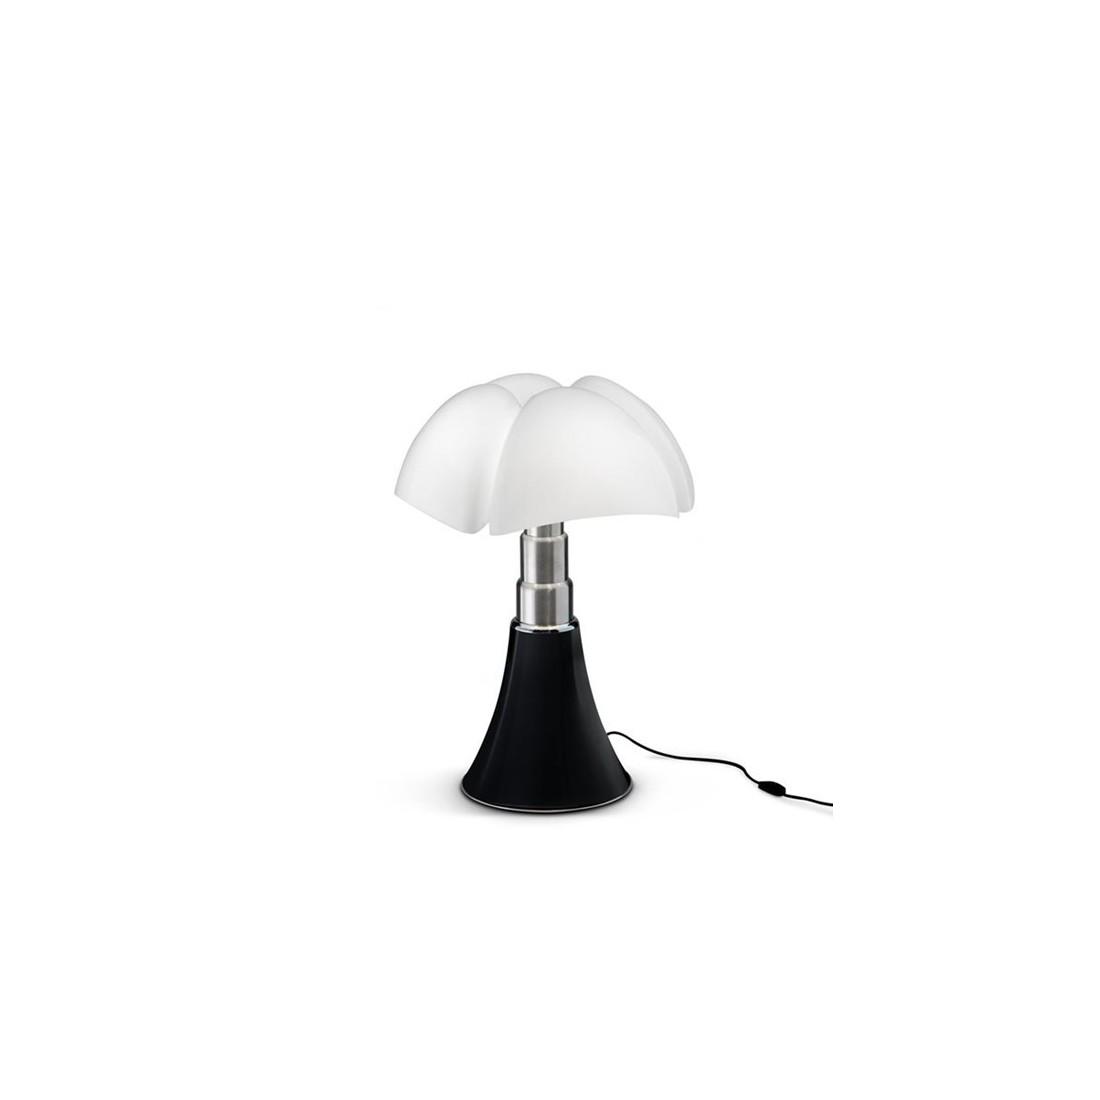 lampe pipistrello noir mat martinelli luce. Black Bedroom Furniture Sets. Home Design Ideas